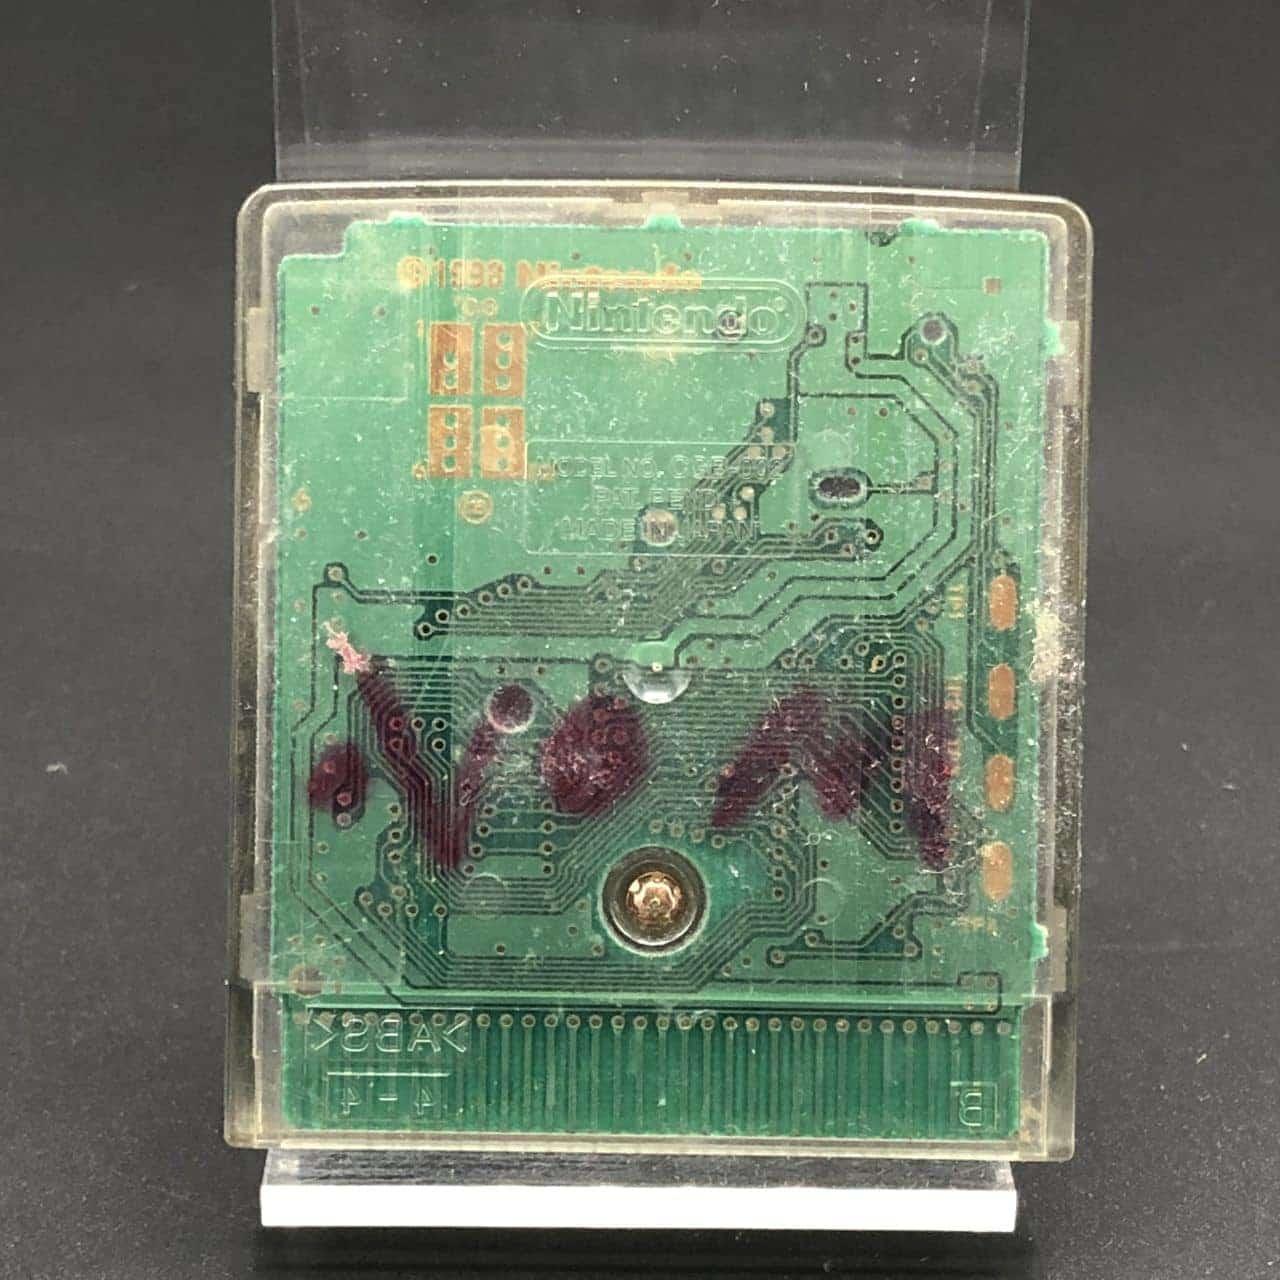 GBC Super Mario Bros. Deluxe (Modul) (Gebrauchsspuren) Nintendo Game Boy Color